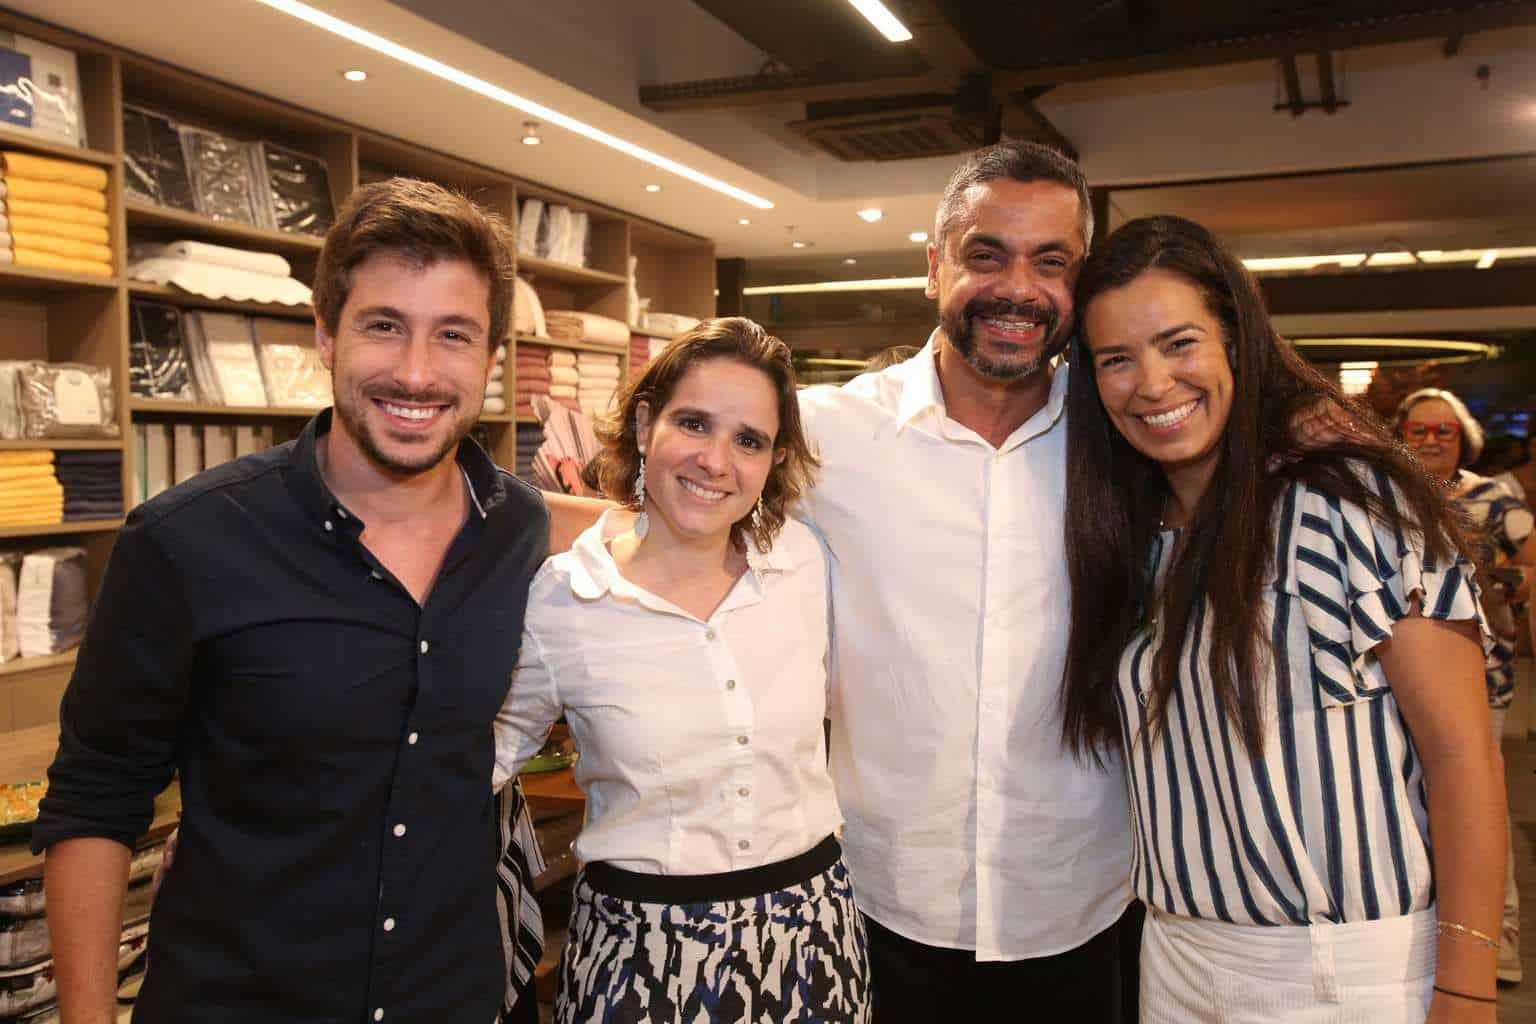 Bruno-Masello-Laura-Vilela-André-Melo-e-Bia-Mariz_-Gabriel-Mendes-2